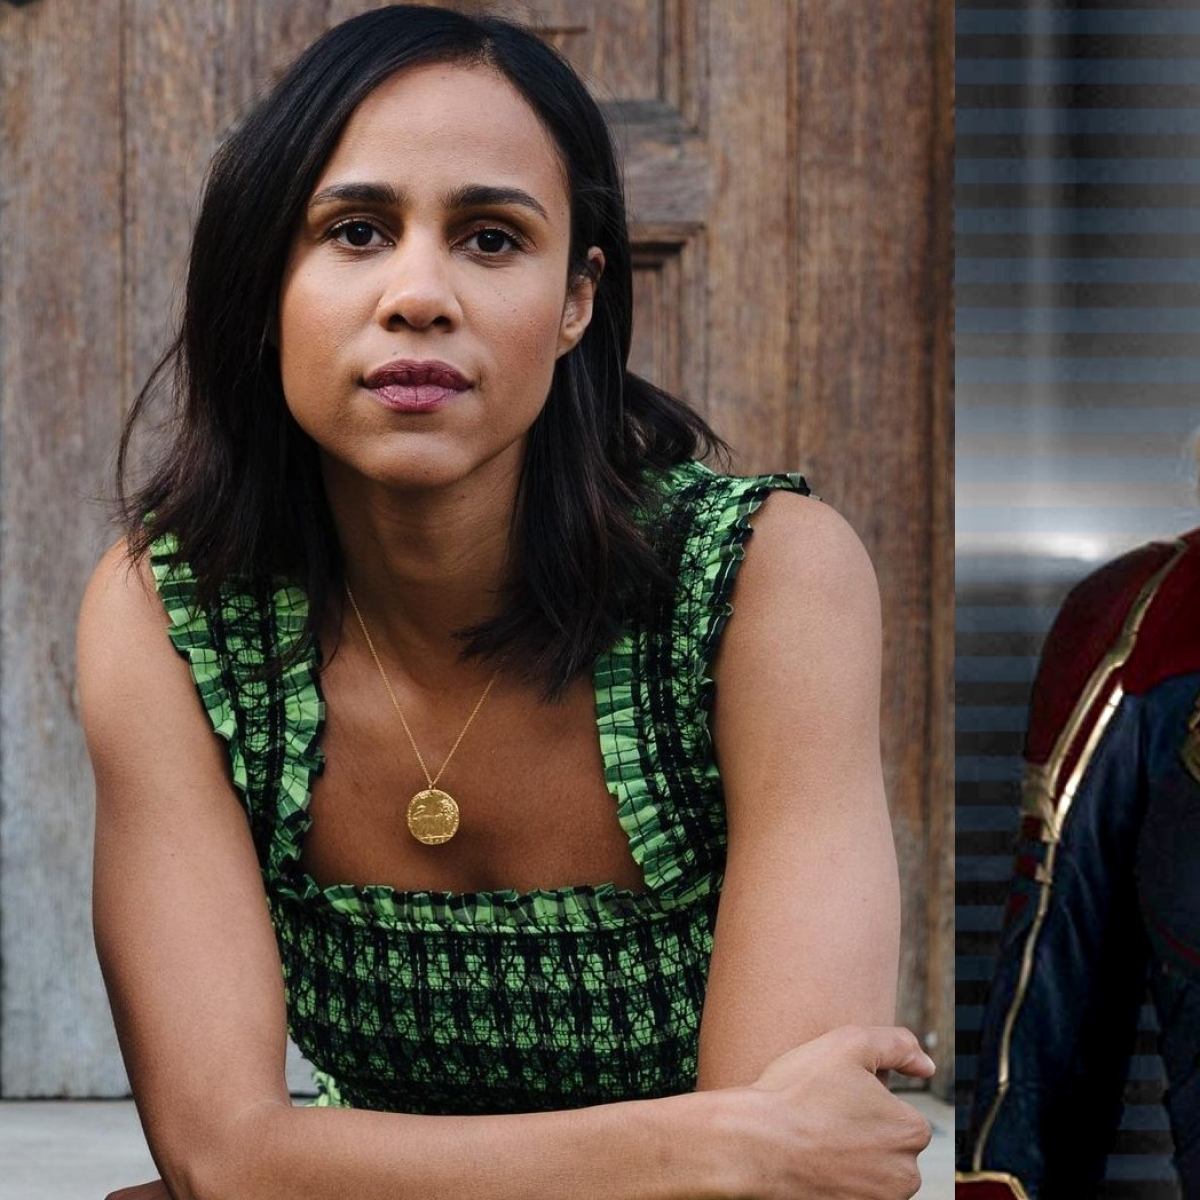 'Nocturnal Animals' actor Zawe Ashton to play villain in 'Captain Marvel 2'